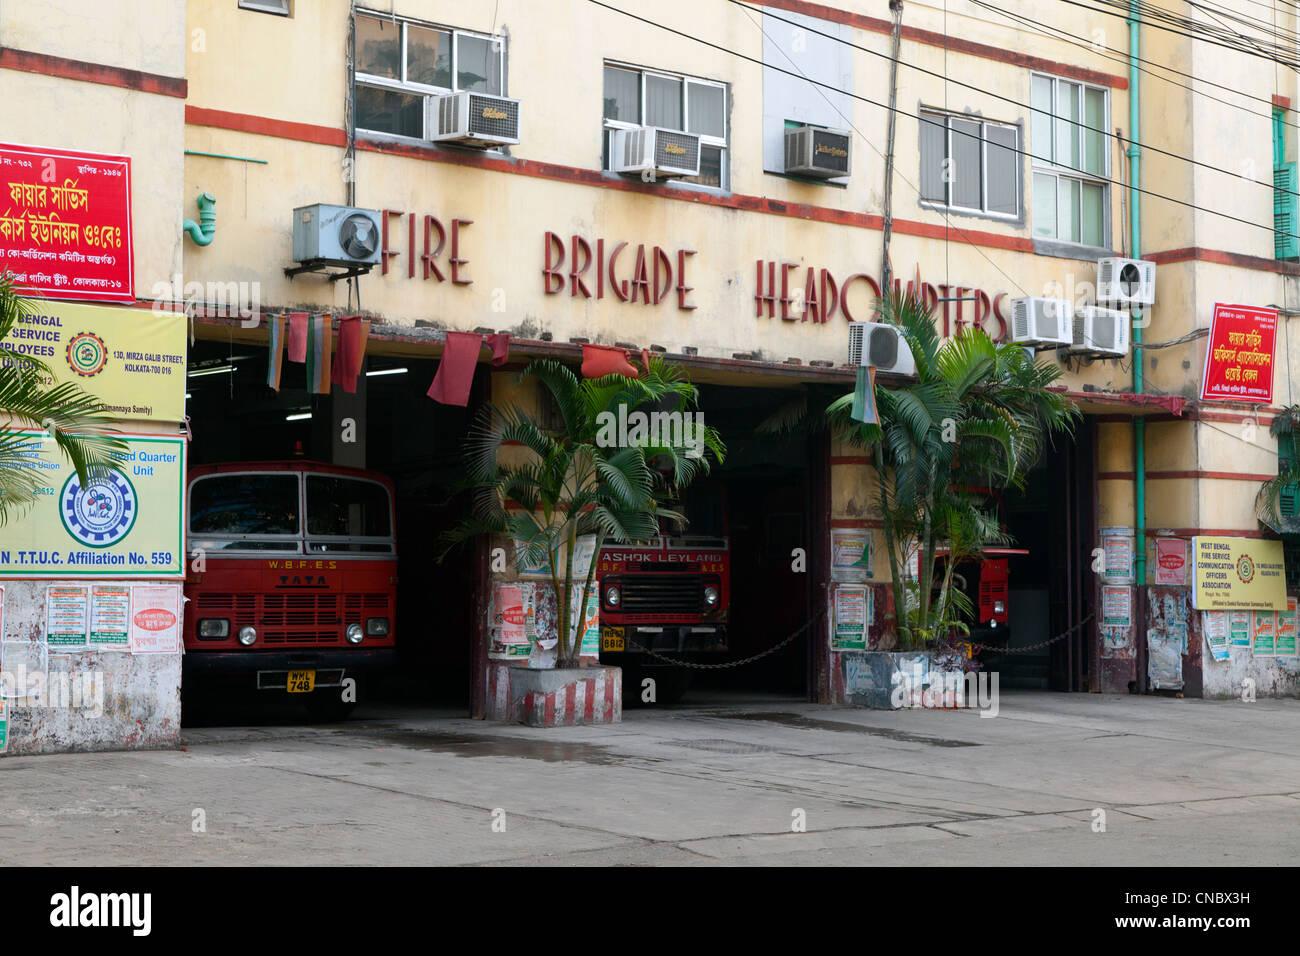 India, West Bengal, Calcutta, Fire Brigade Headquarters - Stock Image